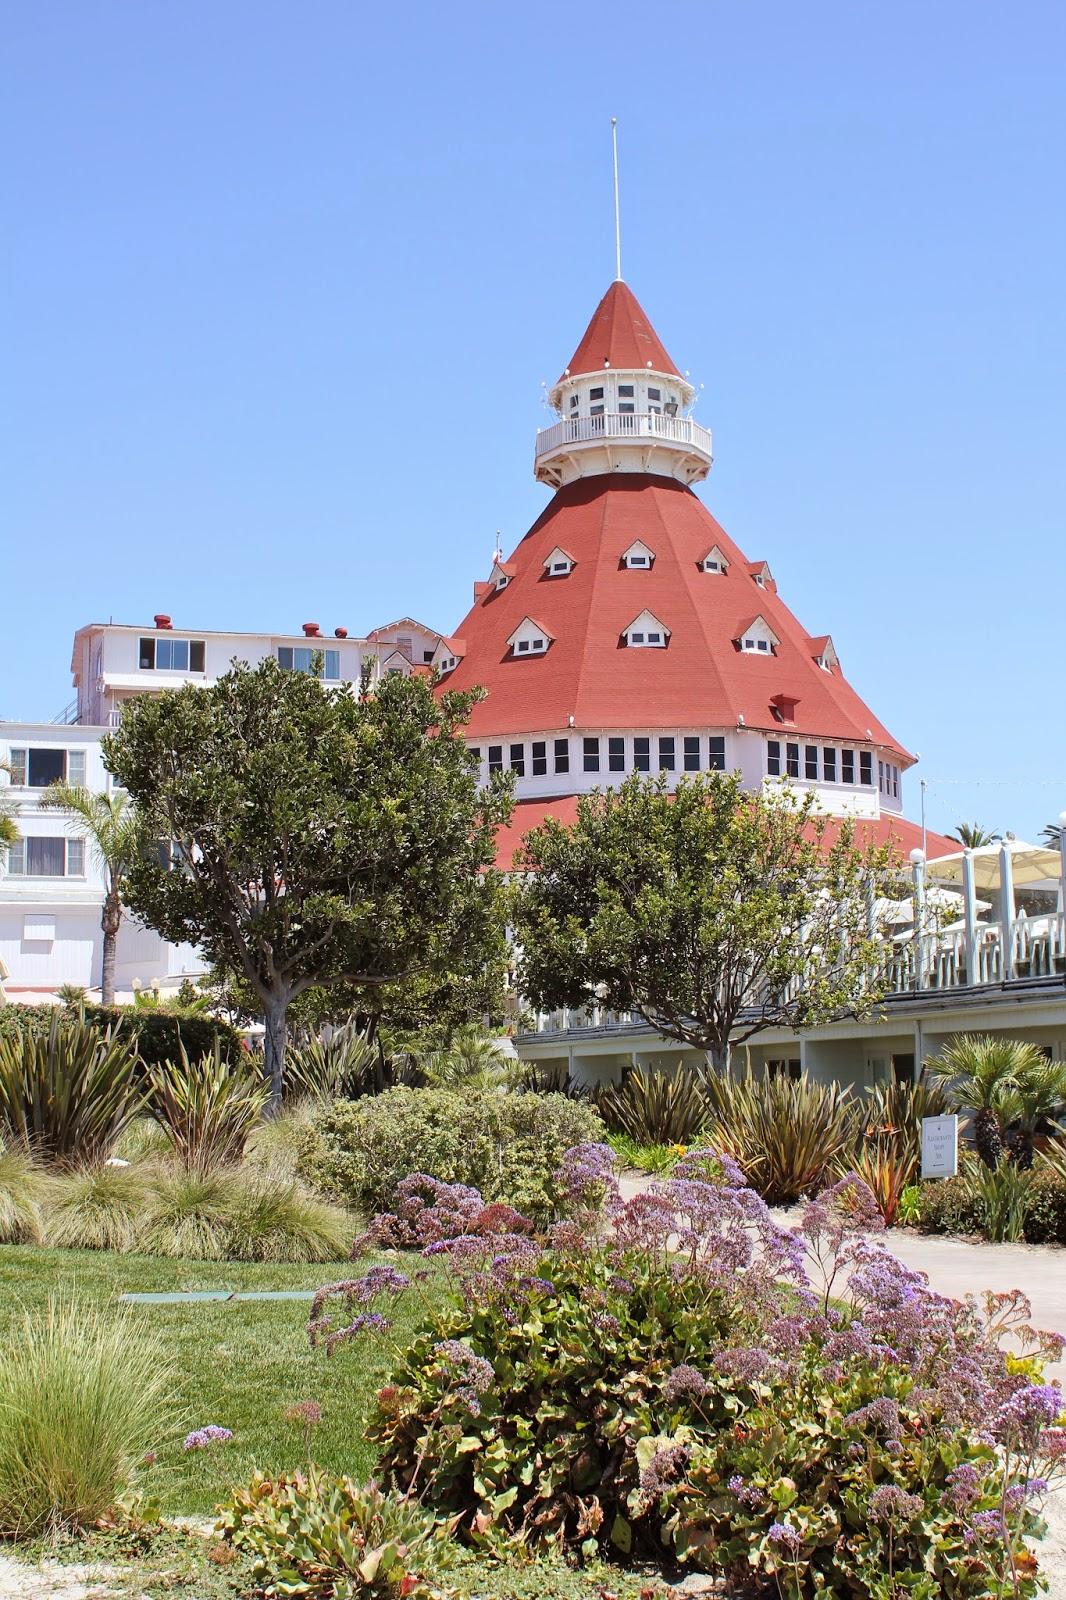 My Life On A Plate: San Diego